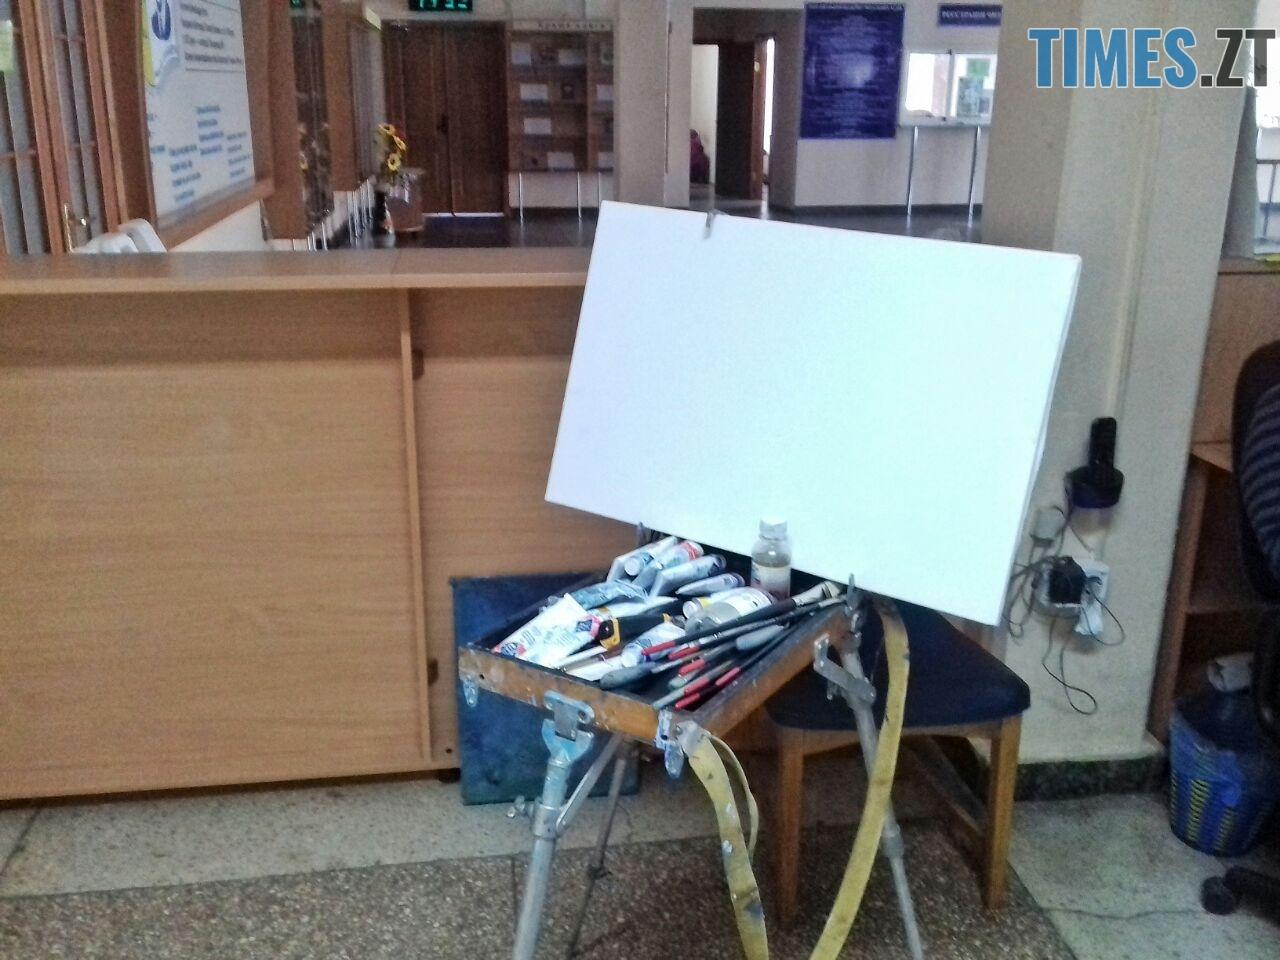 WhatsApp Image 2018 09 01 at 12.12.52 1 - Мистецтво нашвидкуруч: митець показав, як намалювати картину за 20 хвилин (ФОТО)